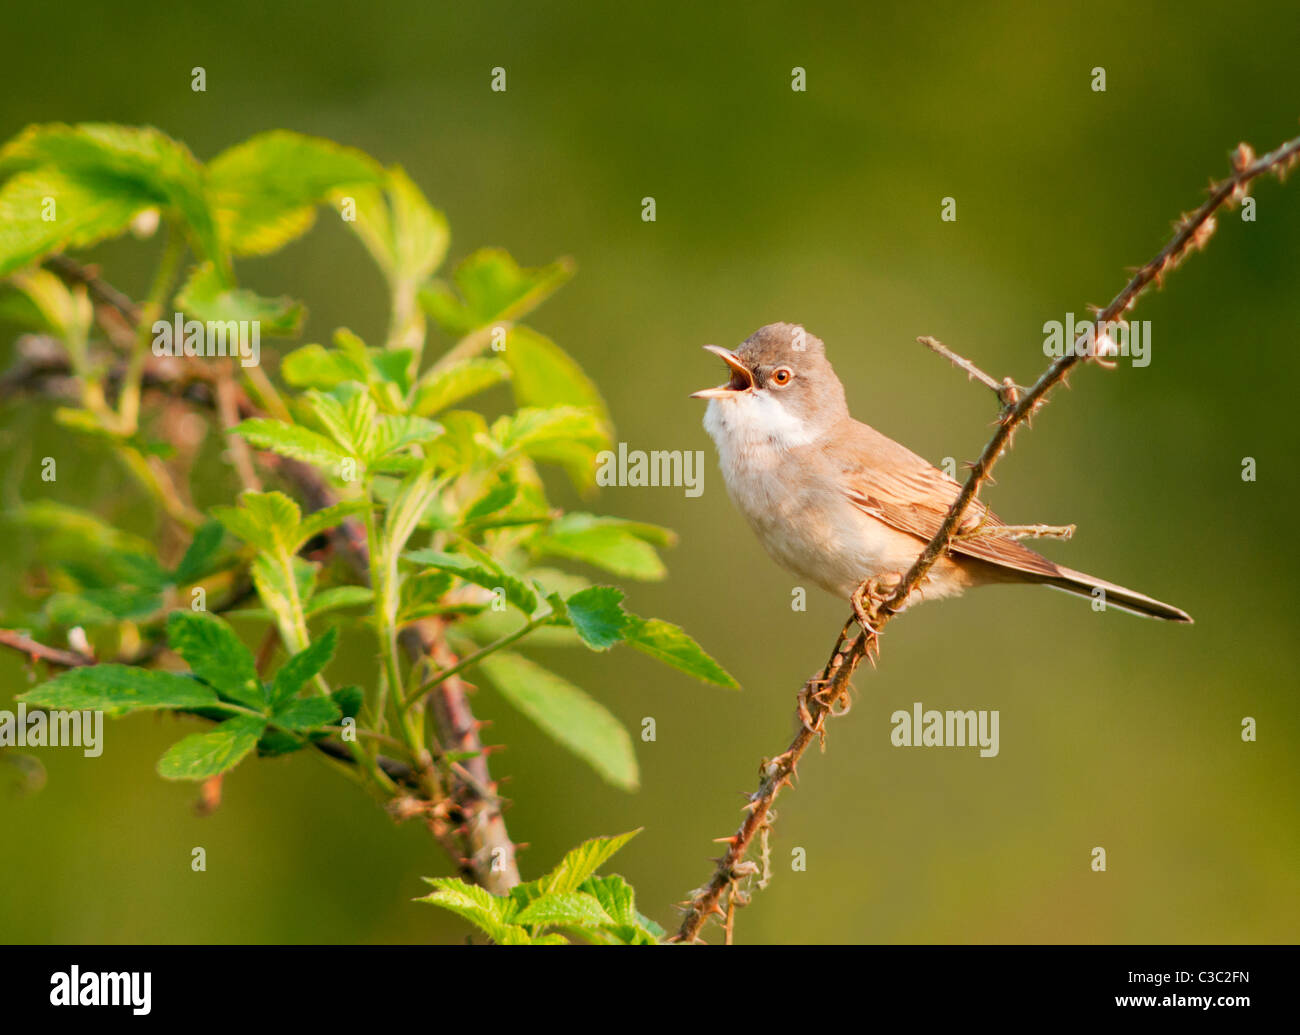 Whitethroat (Sylvia communis) singing from perch, Warwickshire - Stock Image